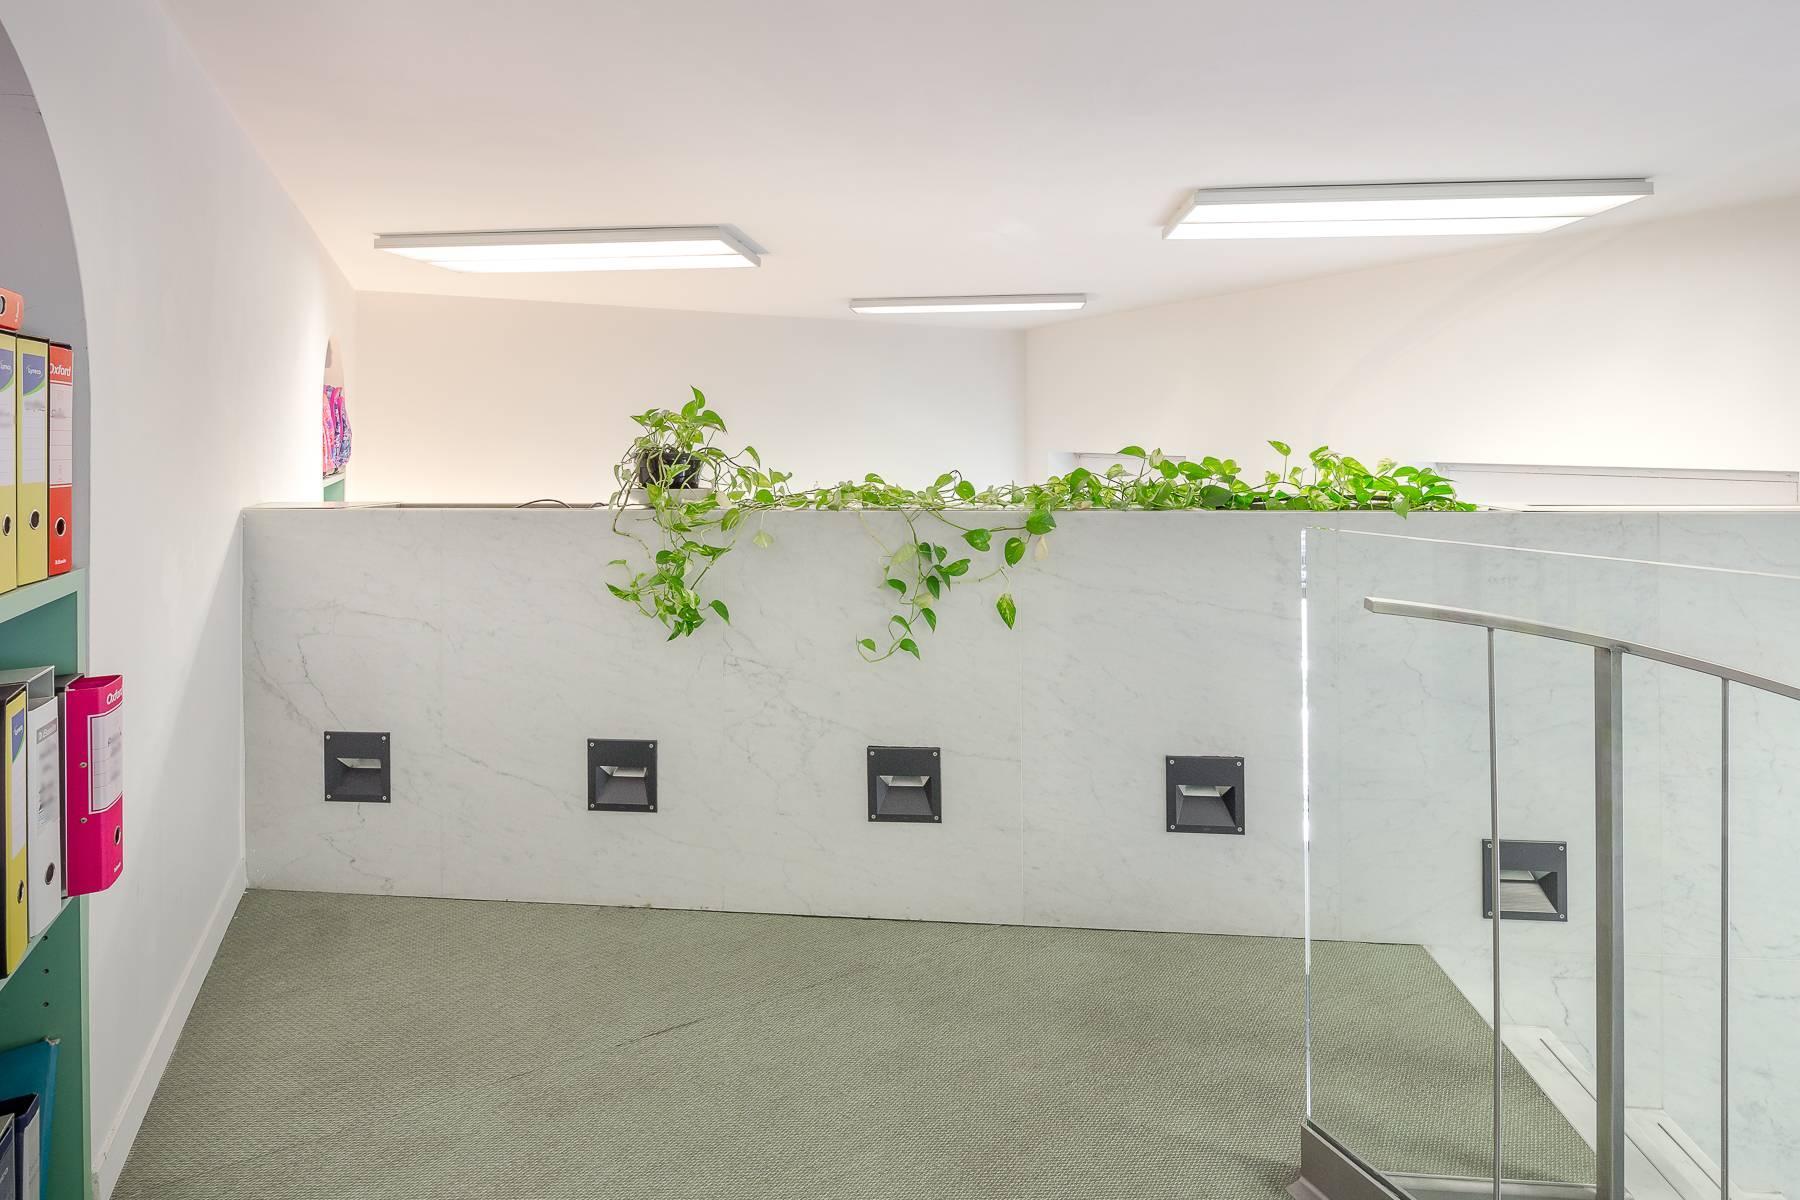 Open space office/residential property in Piazza Giovine Italia/Via Aurelio Saffi - 5